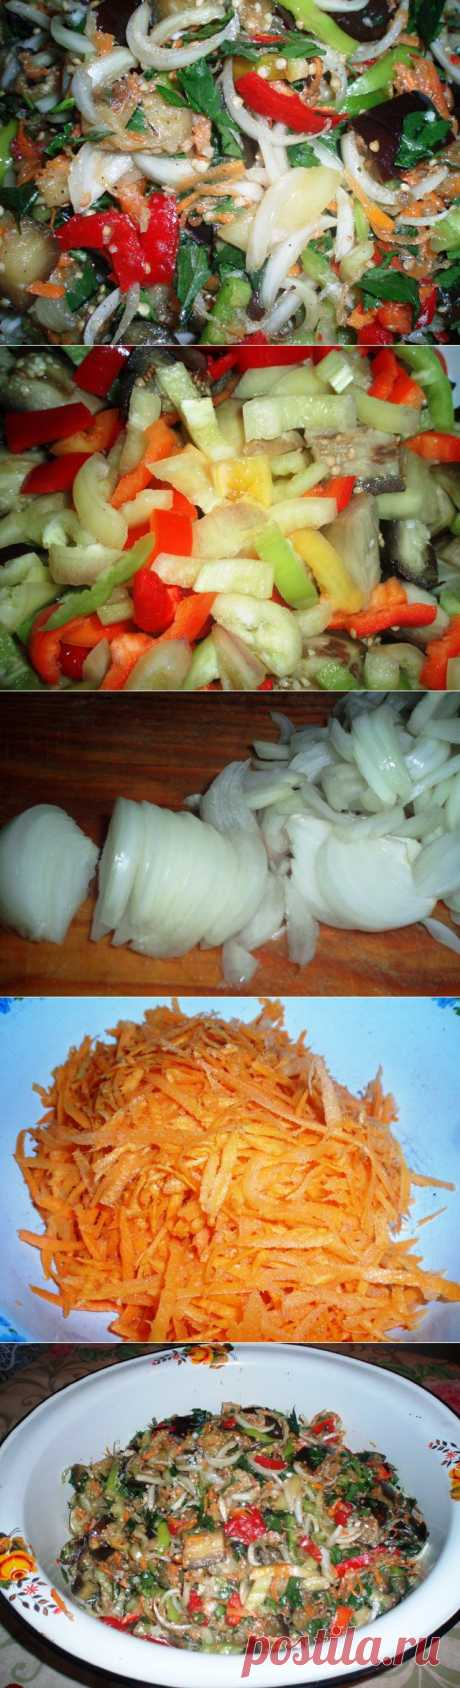 Закуска острая с баклажанами | Домашняя еда